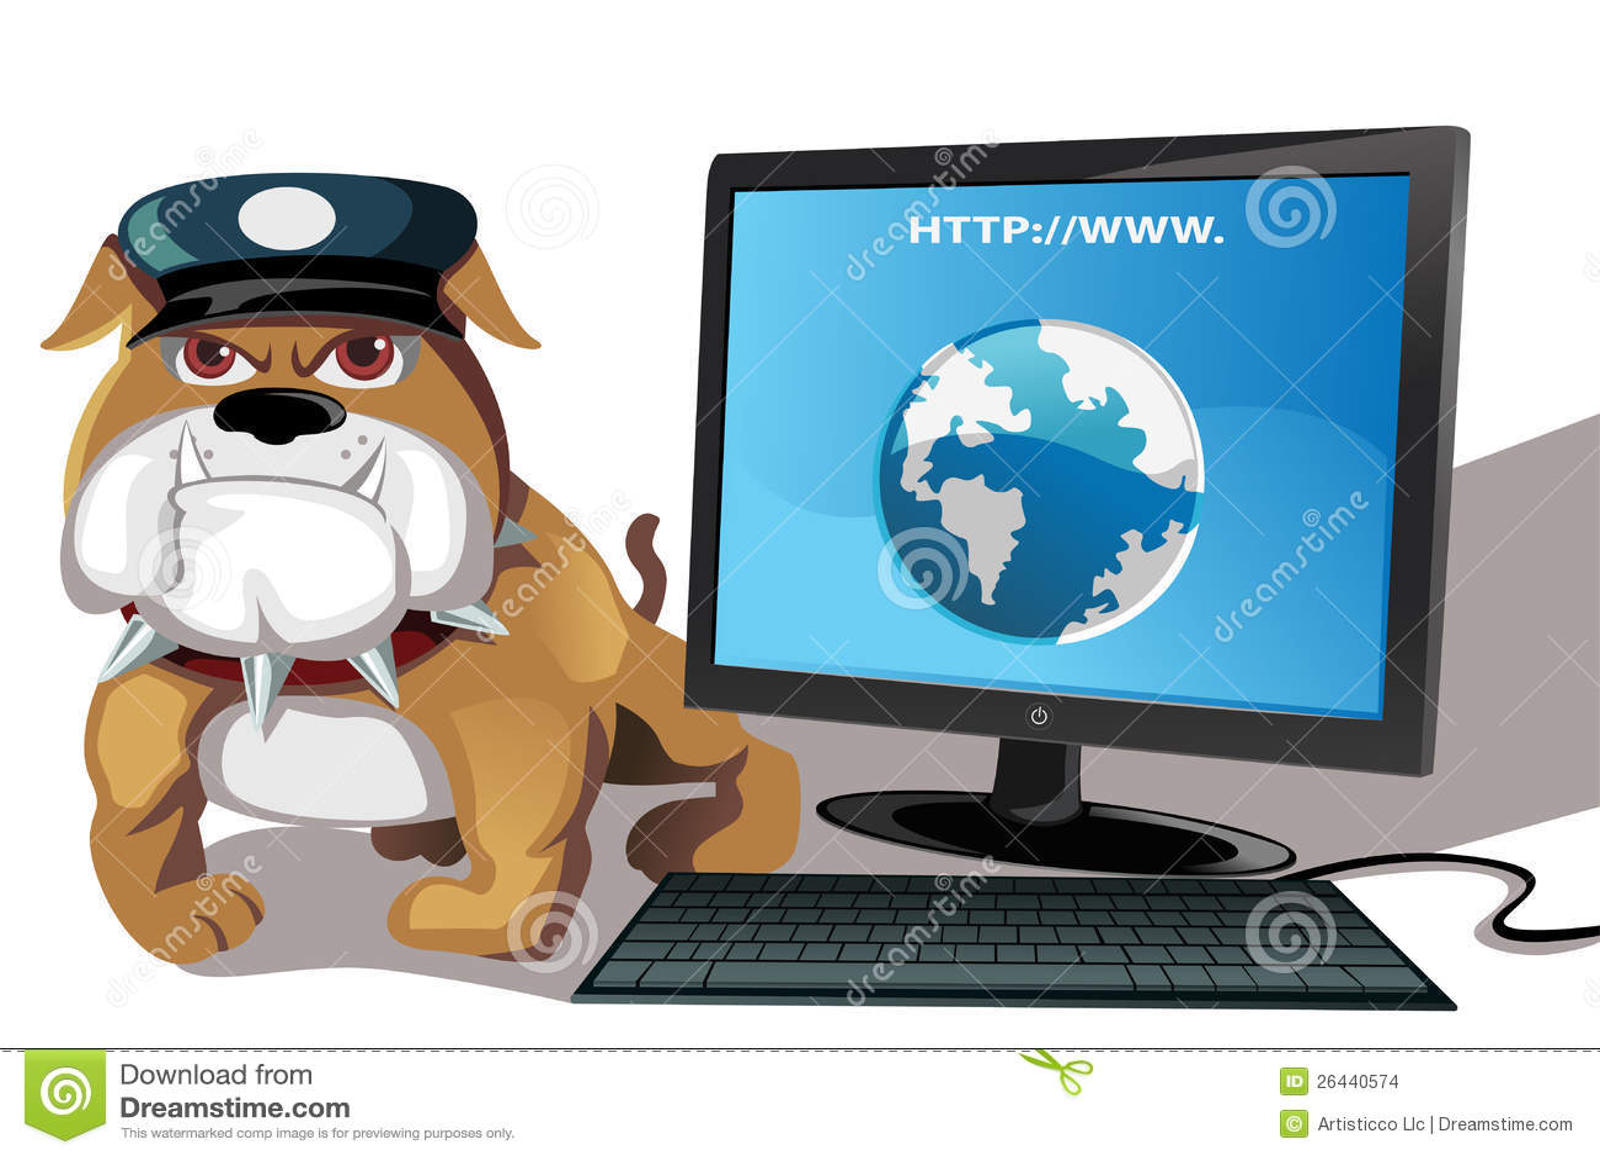 United Security Technology Llc